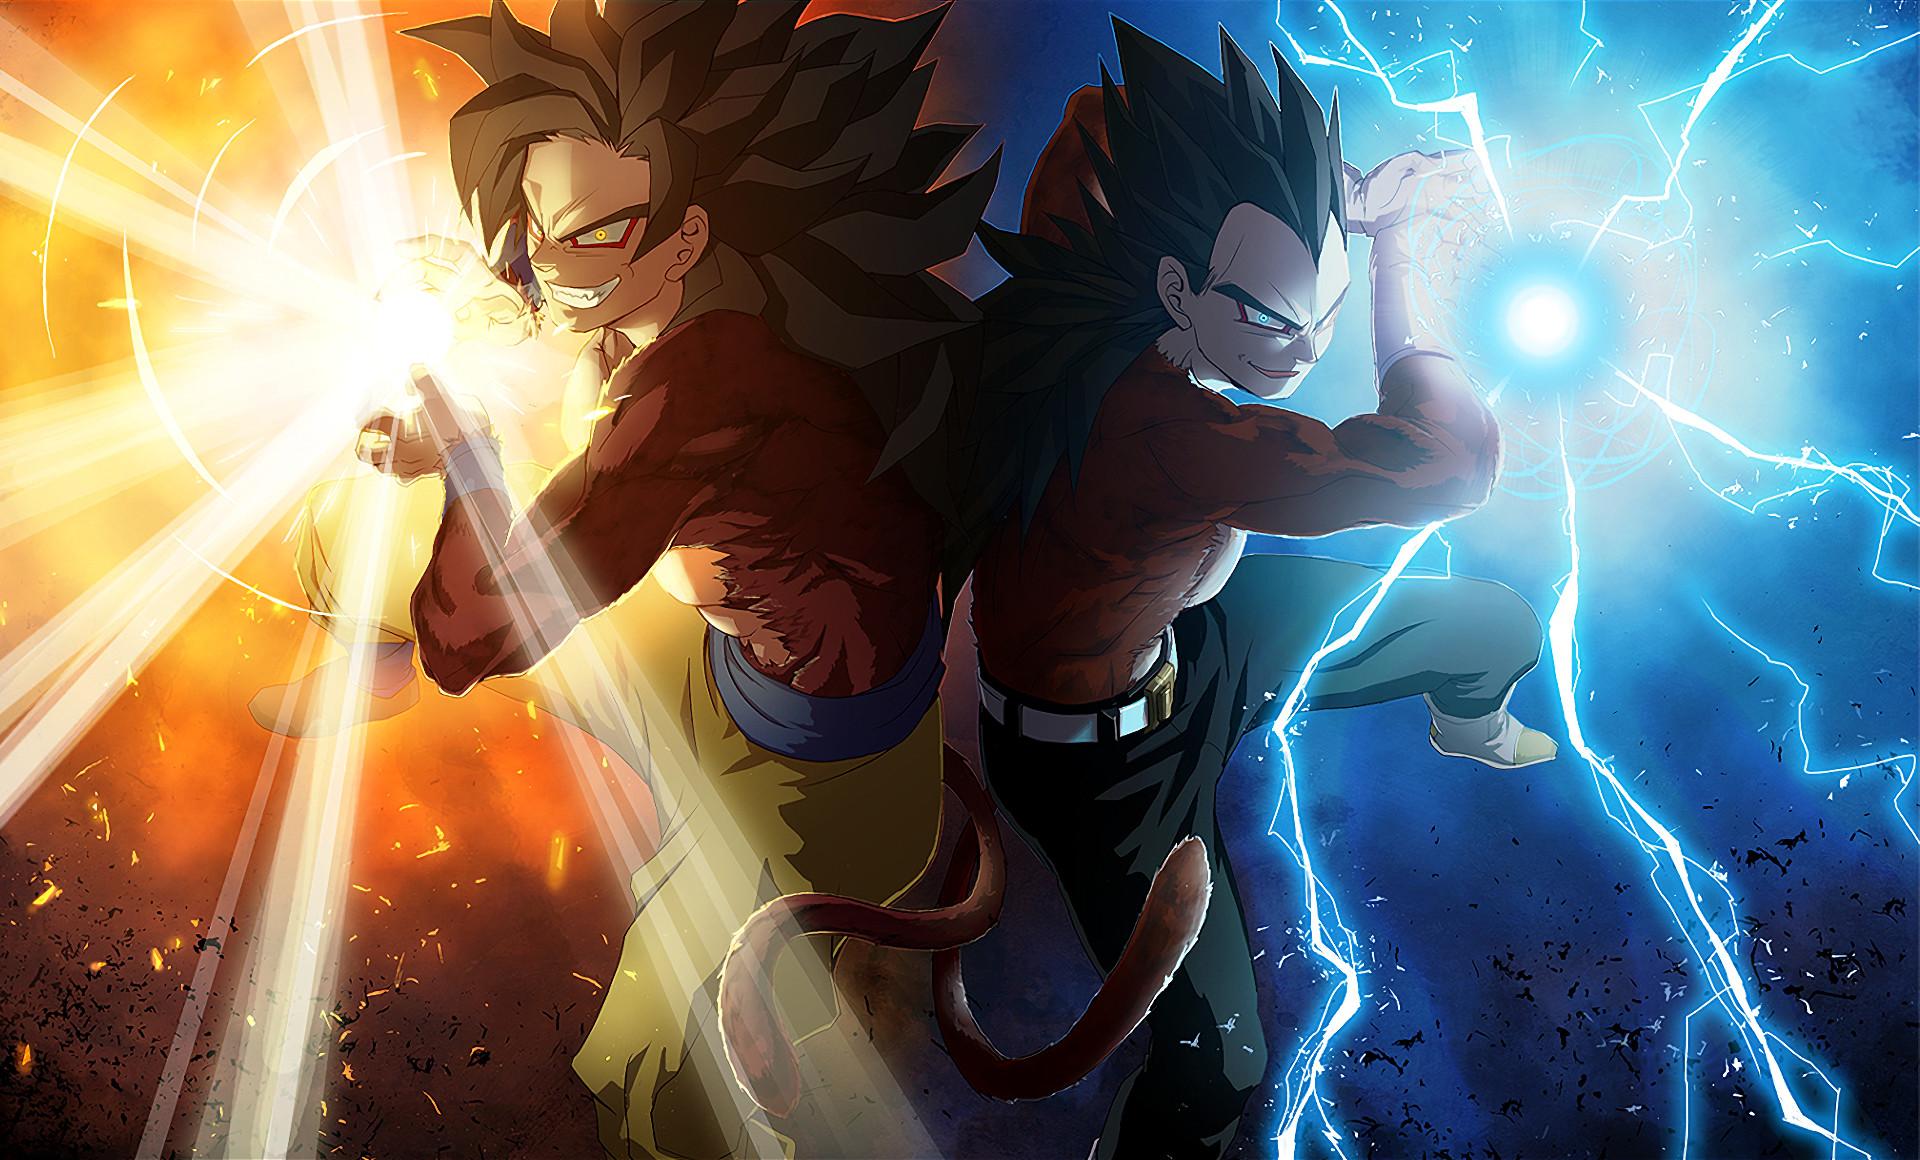 … Super Saiyan God · Fondo de pantalla HD | Fondo de Escritorio ID:593473